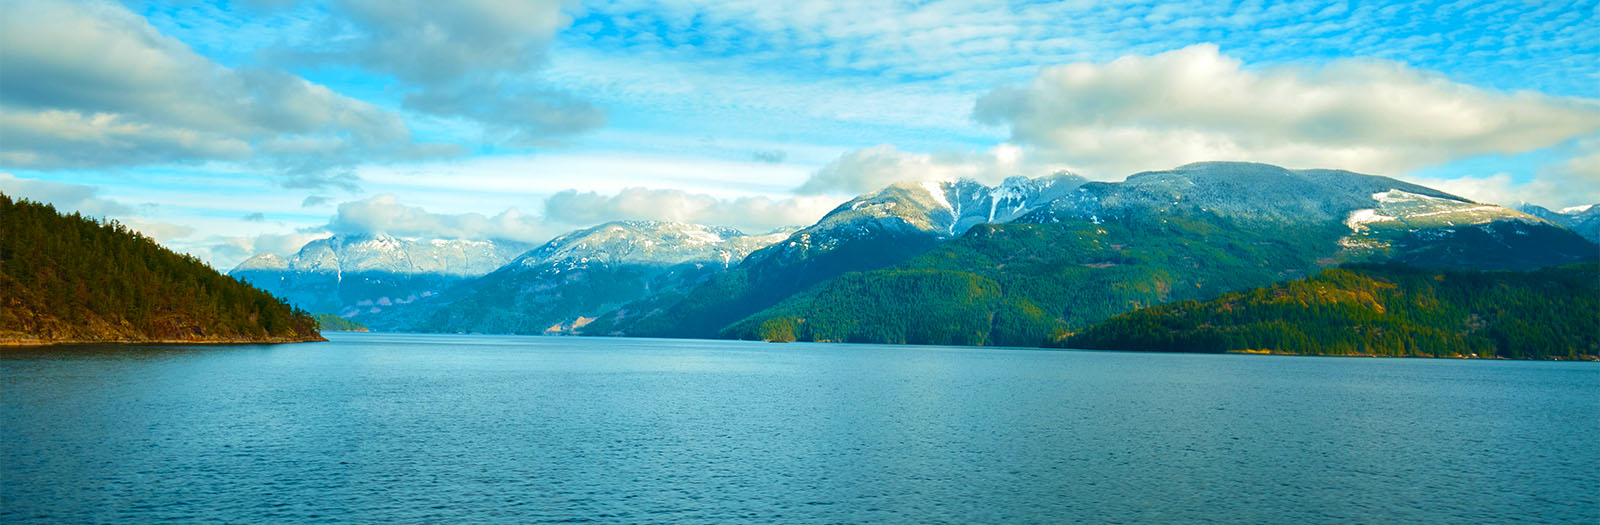 Earls Cove, British Columbia